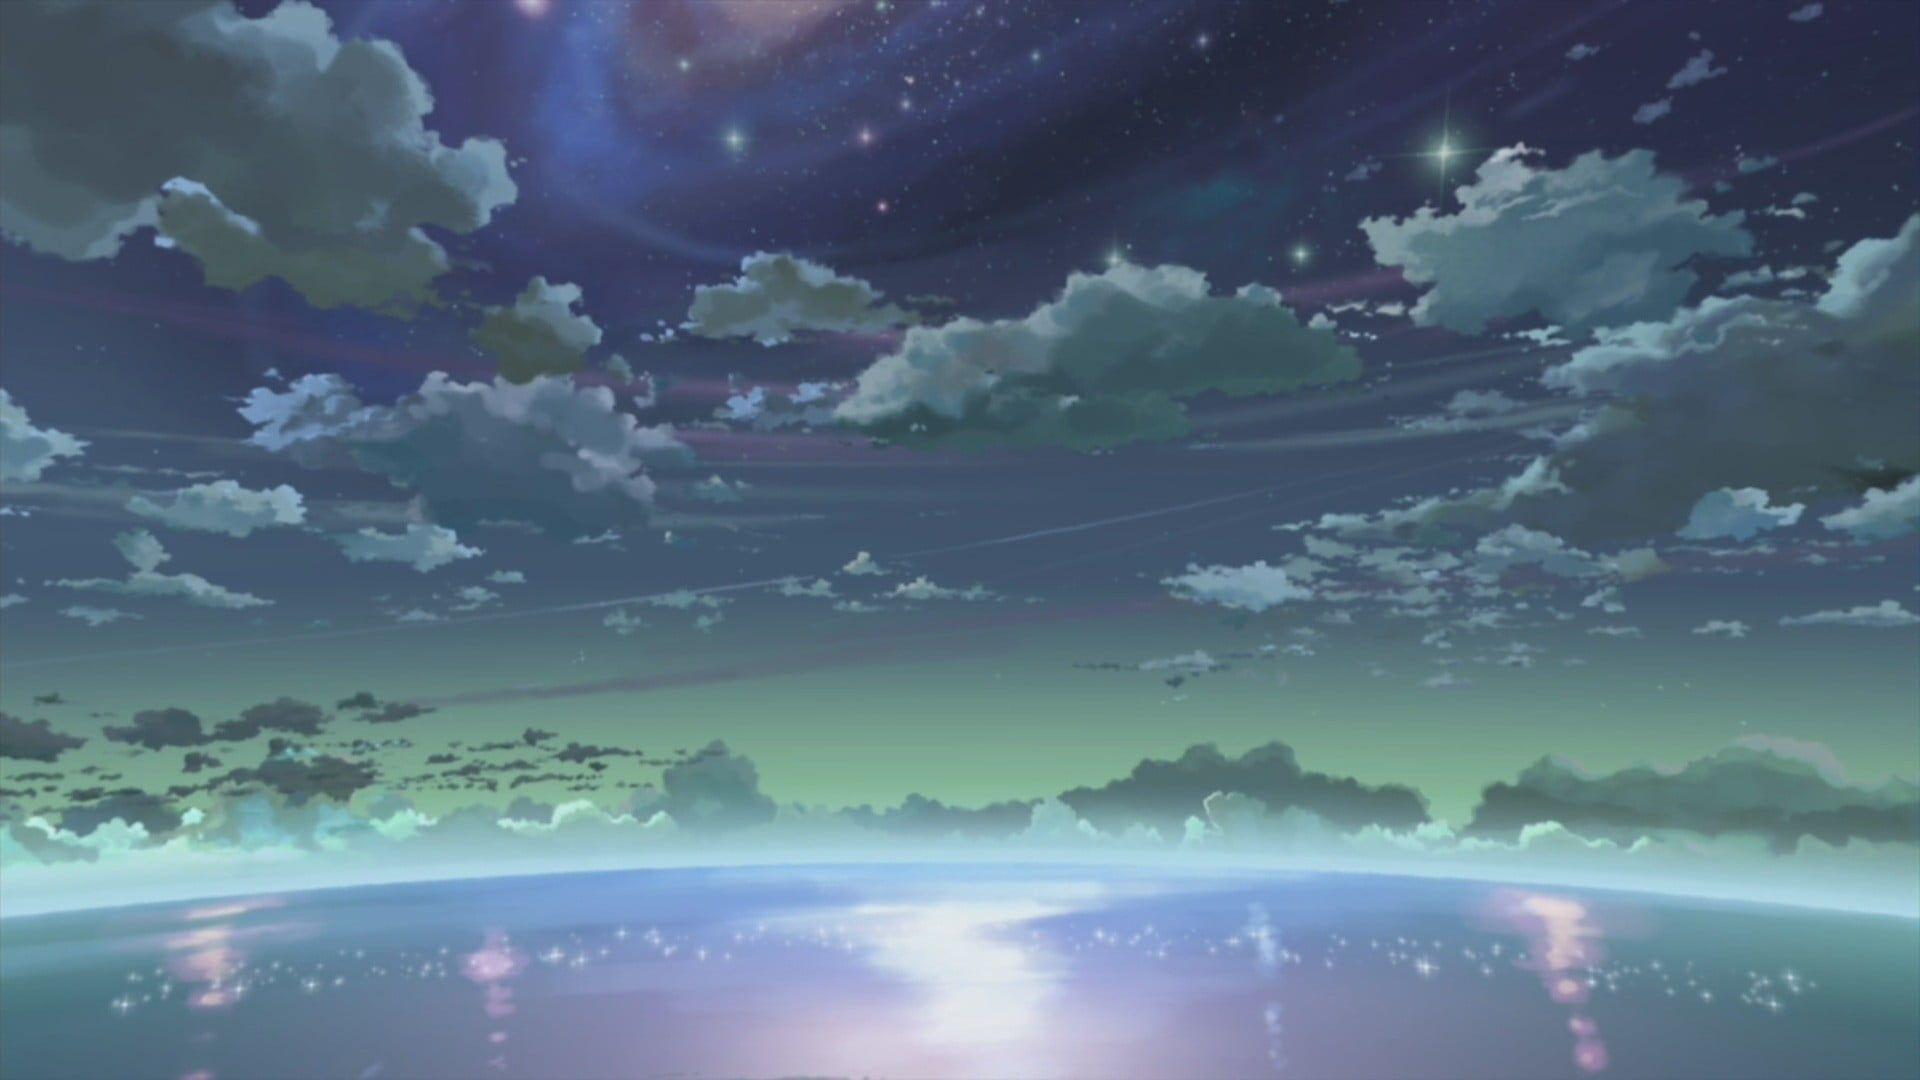 white clouds 5 Centimeters Per Second Makoto Shinkai sky